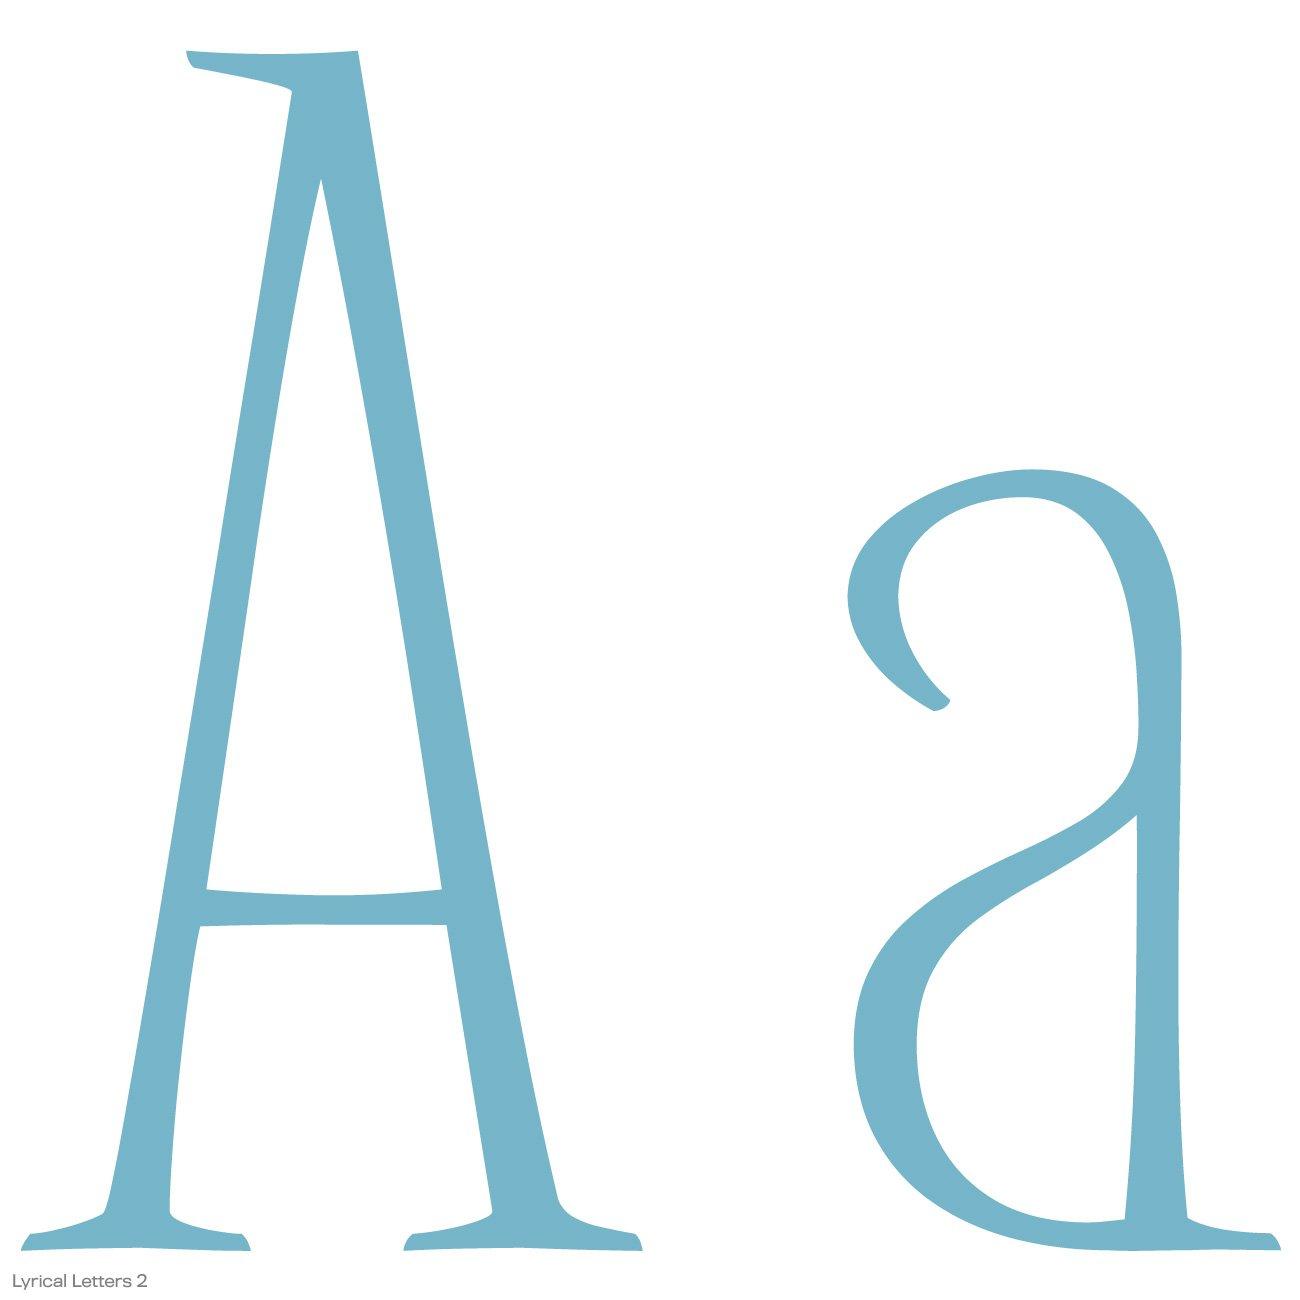 Cricut Lyrical Letters 2 Cartridge by Cricut (Image #27)